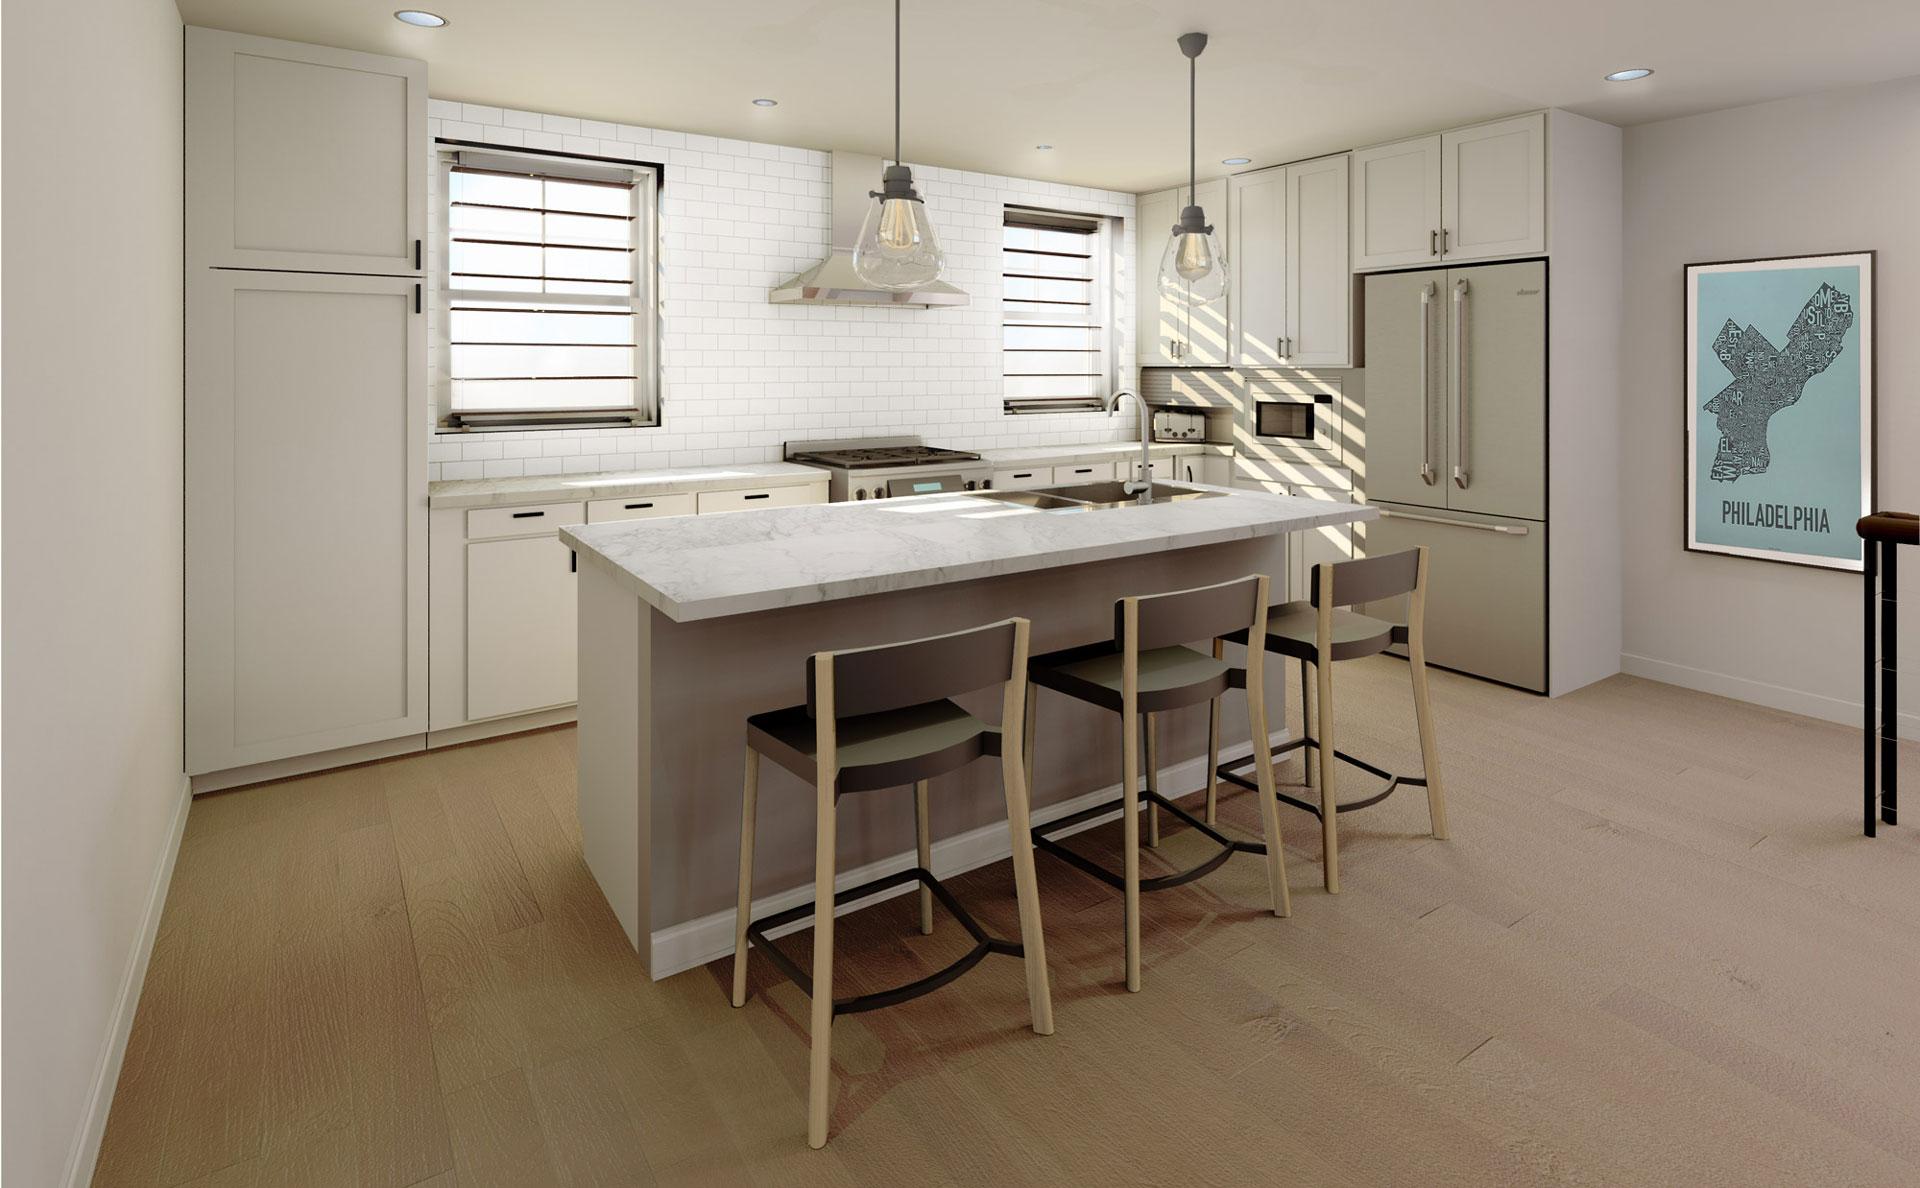 New construction single family home kitchen design Philadelphia